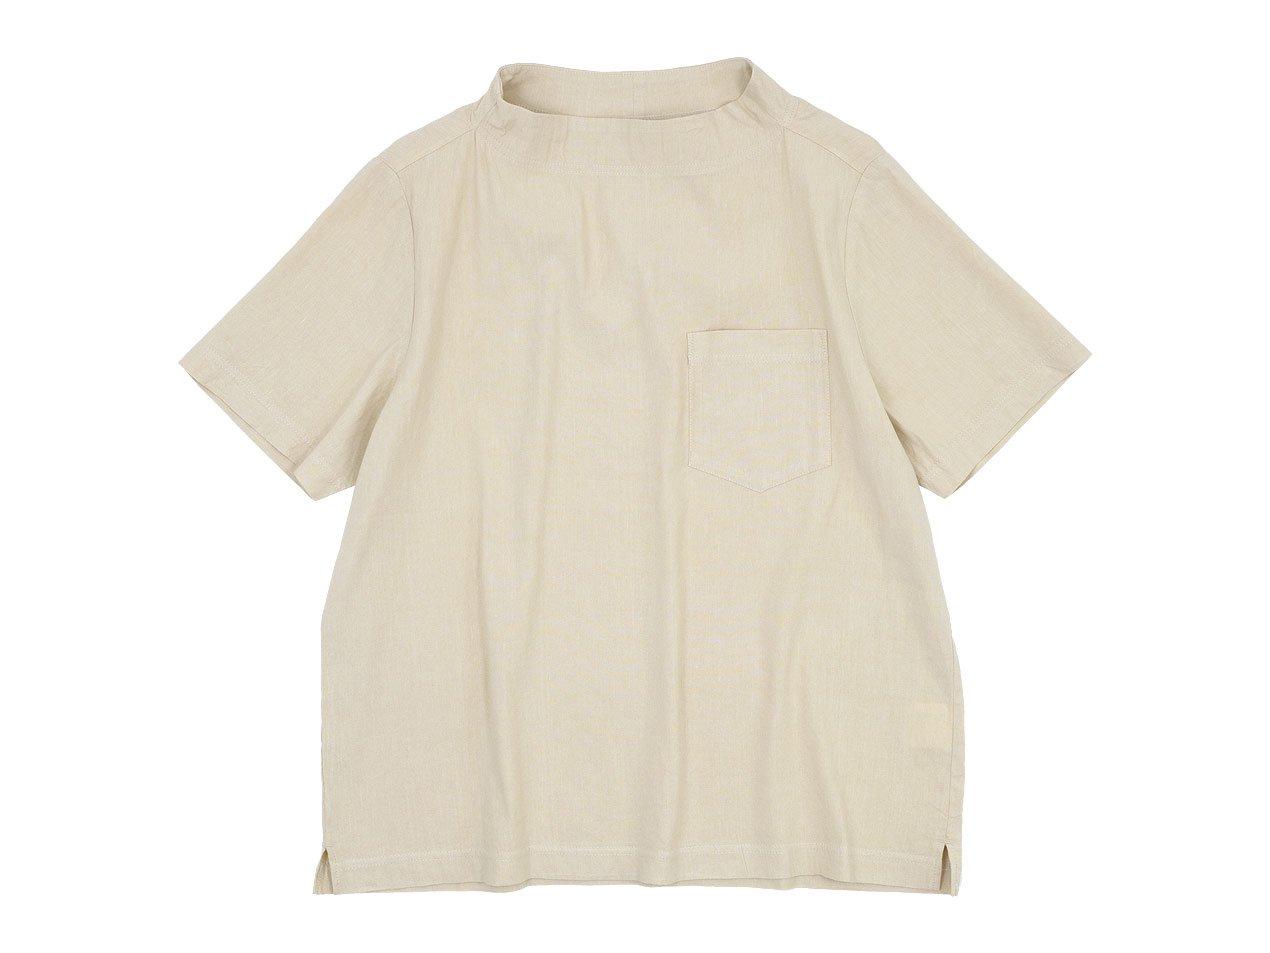 nisica ガンジープルオーバーシャツ 半袖 BEIGE